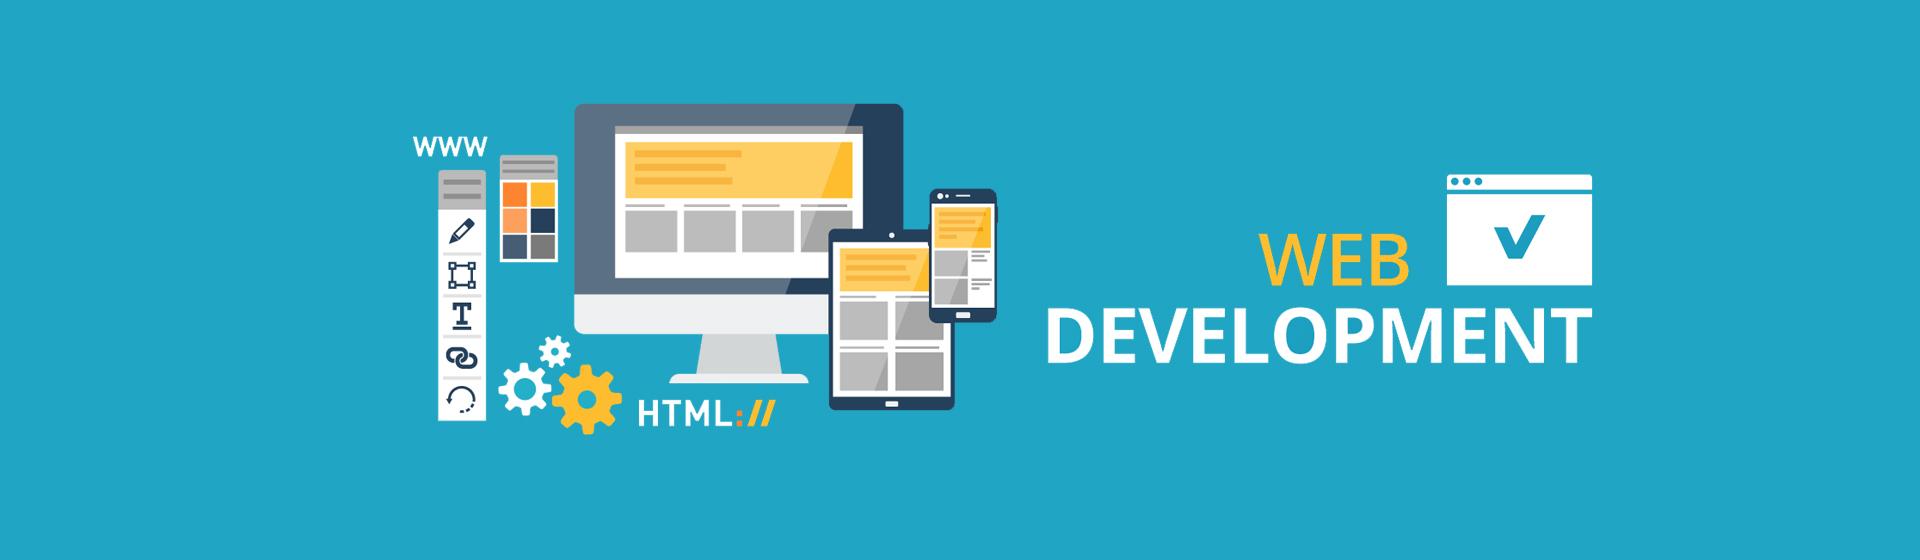 creating ecommerce website in dreamweaver pdf